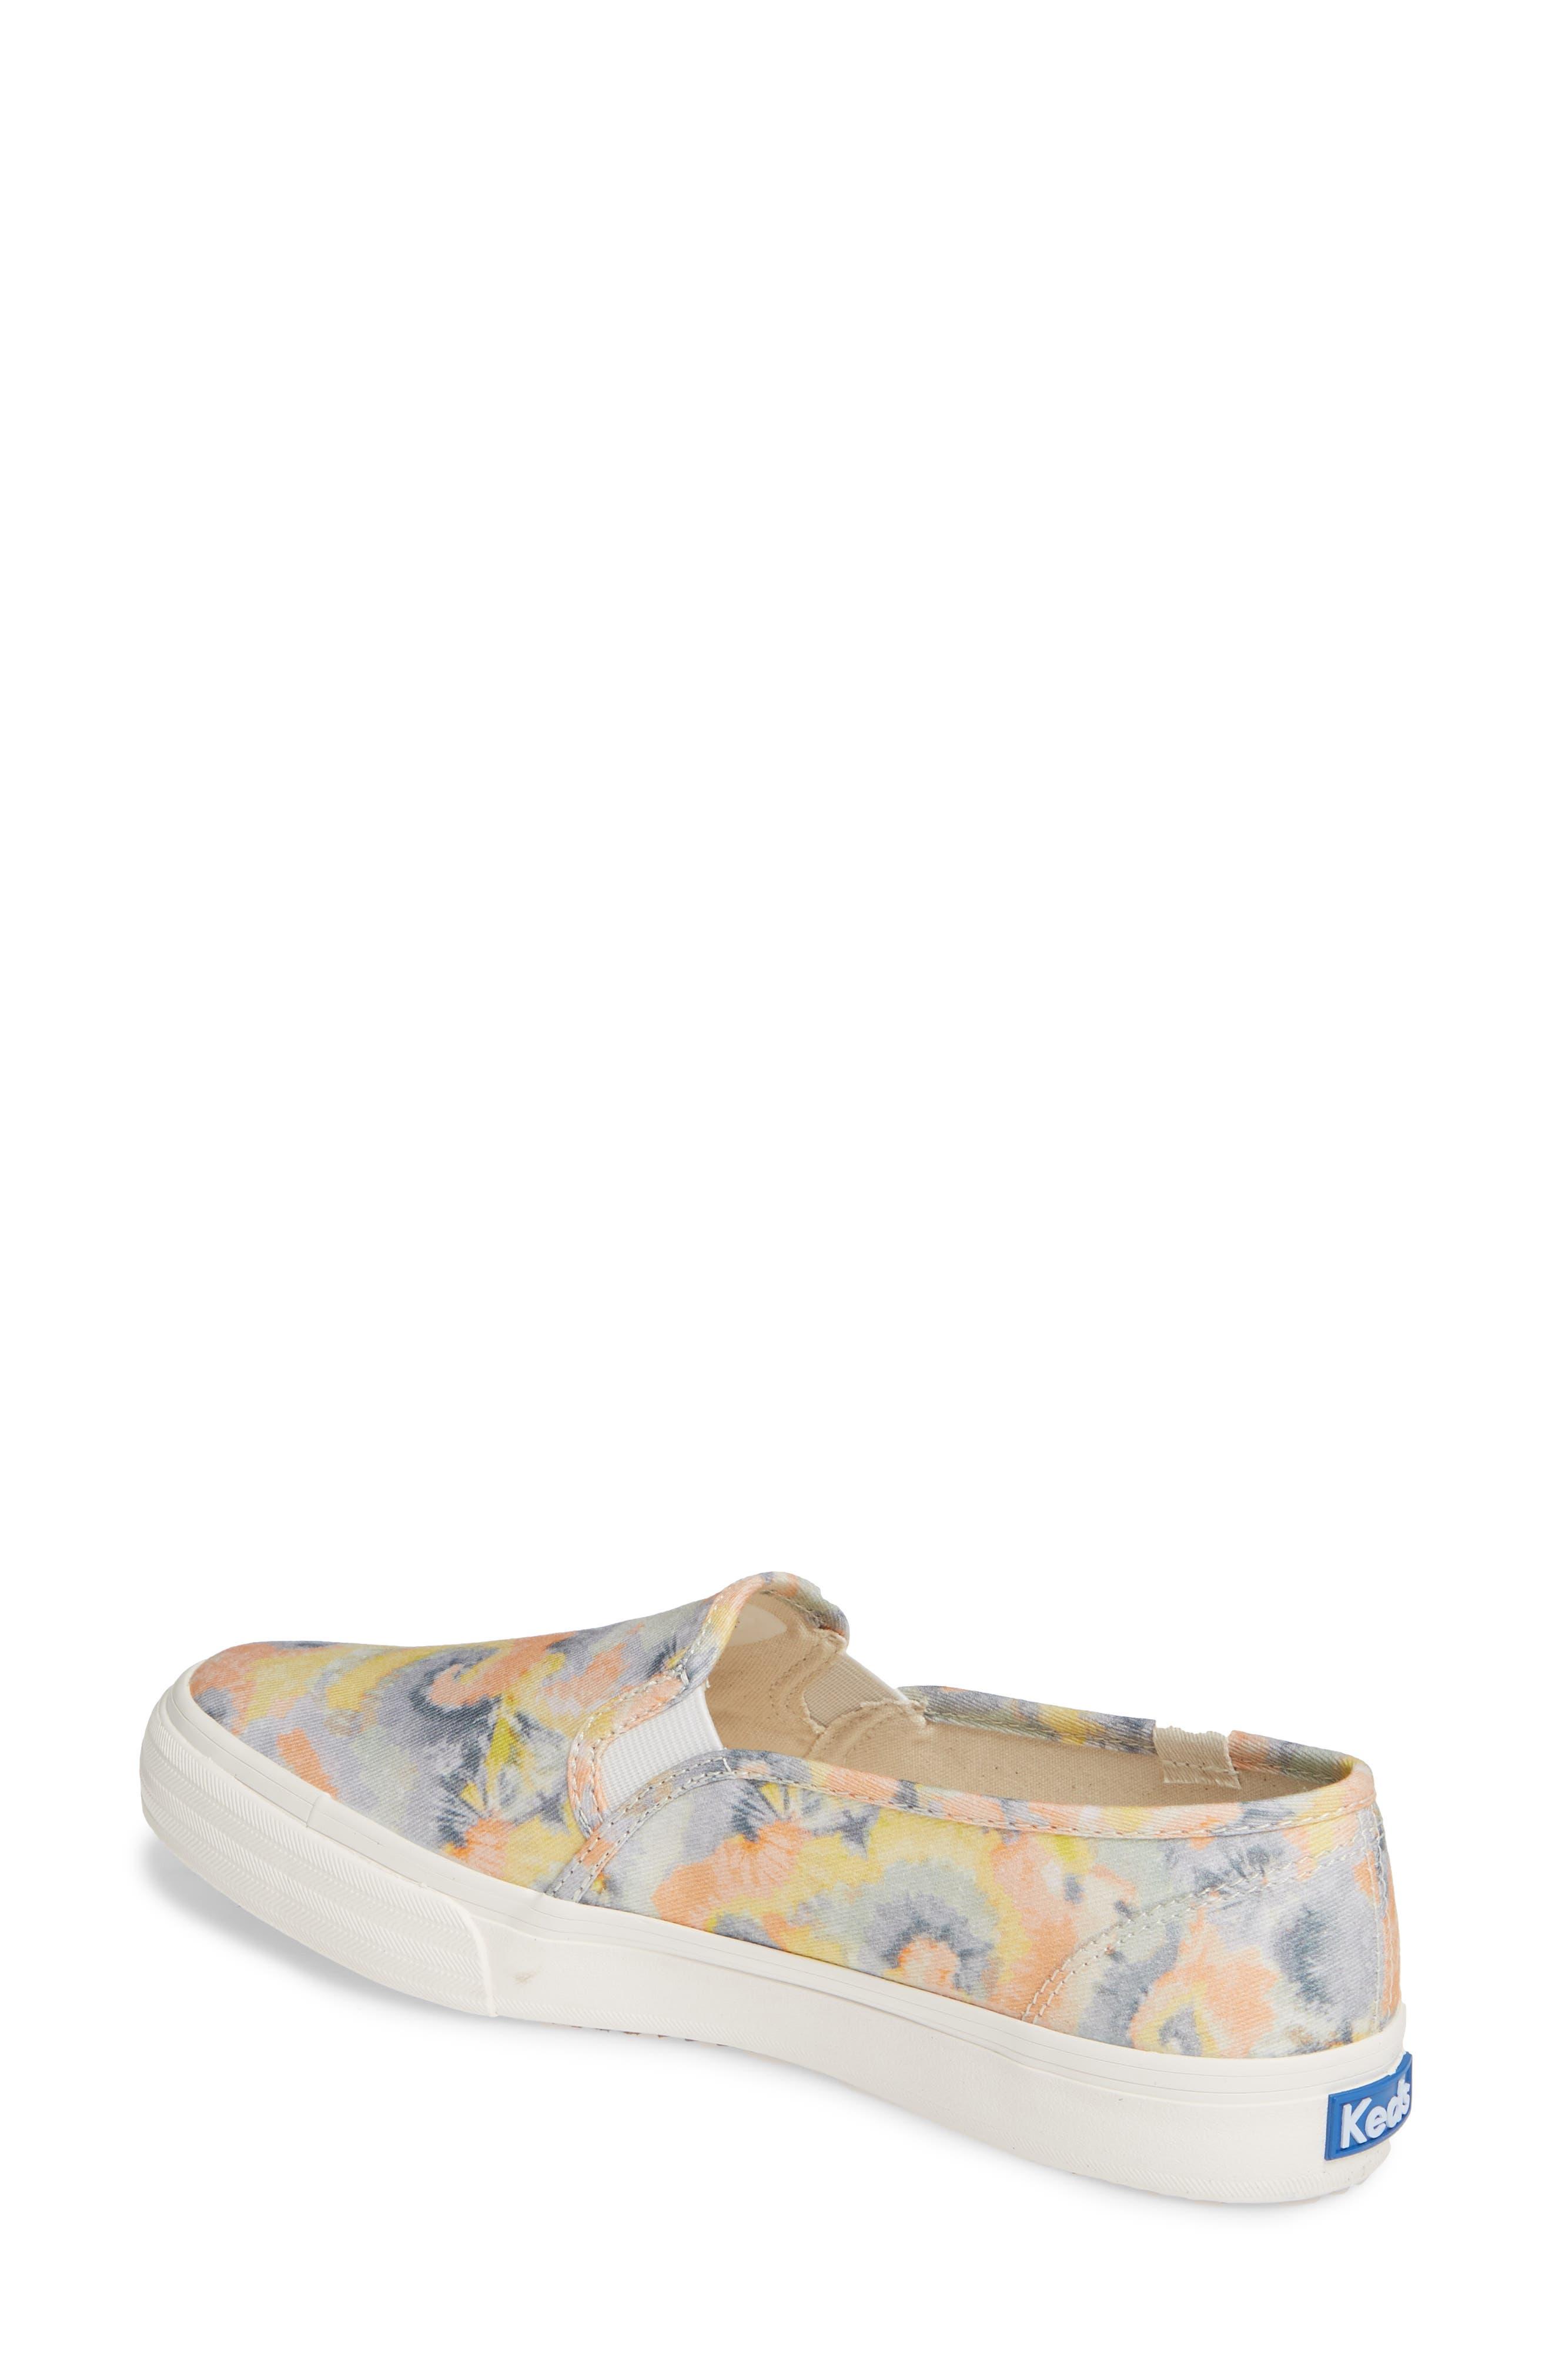 KEDS<SUP>®</SUP>, Double Decker Tie Dye Sneaker, Alternate thumbnail 2, color, PINK MULTI